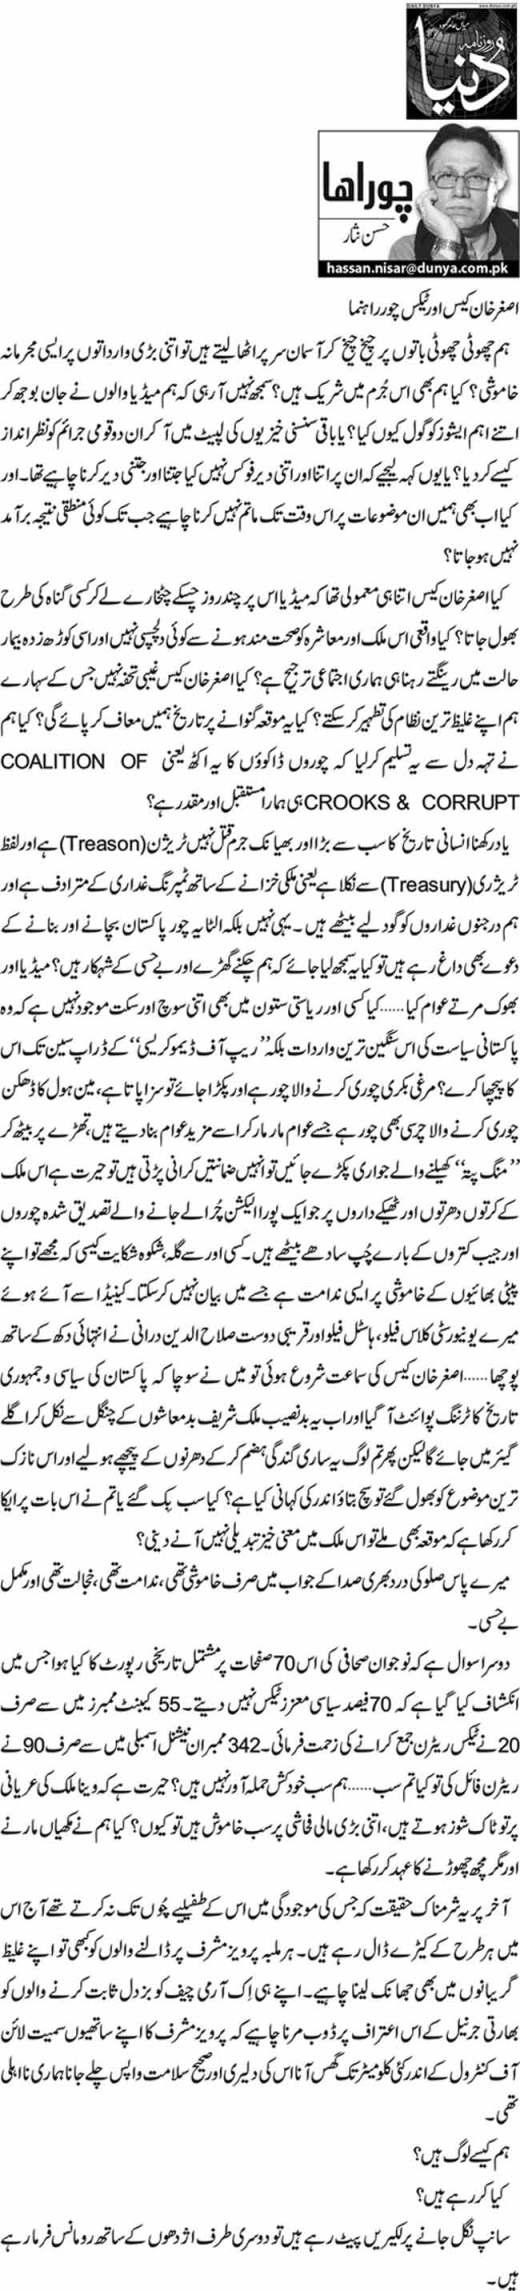 Asghar Khan case aur tax chor rehnuma - Hassan Nisar